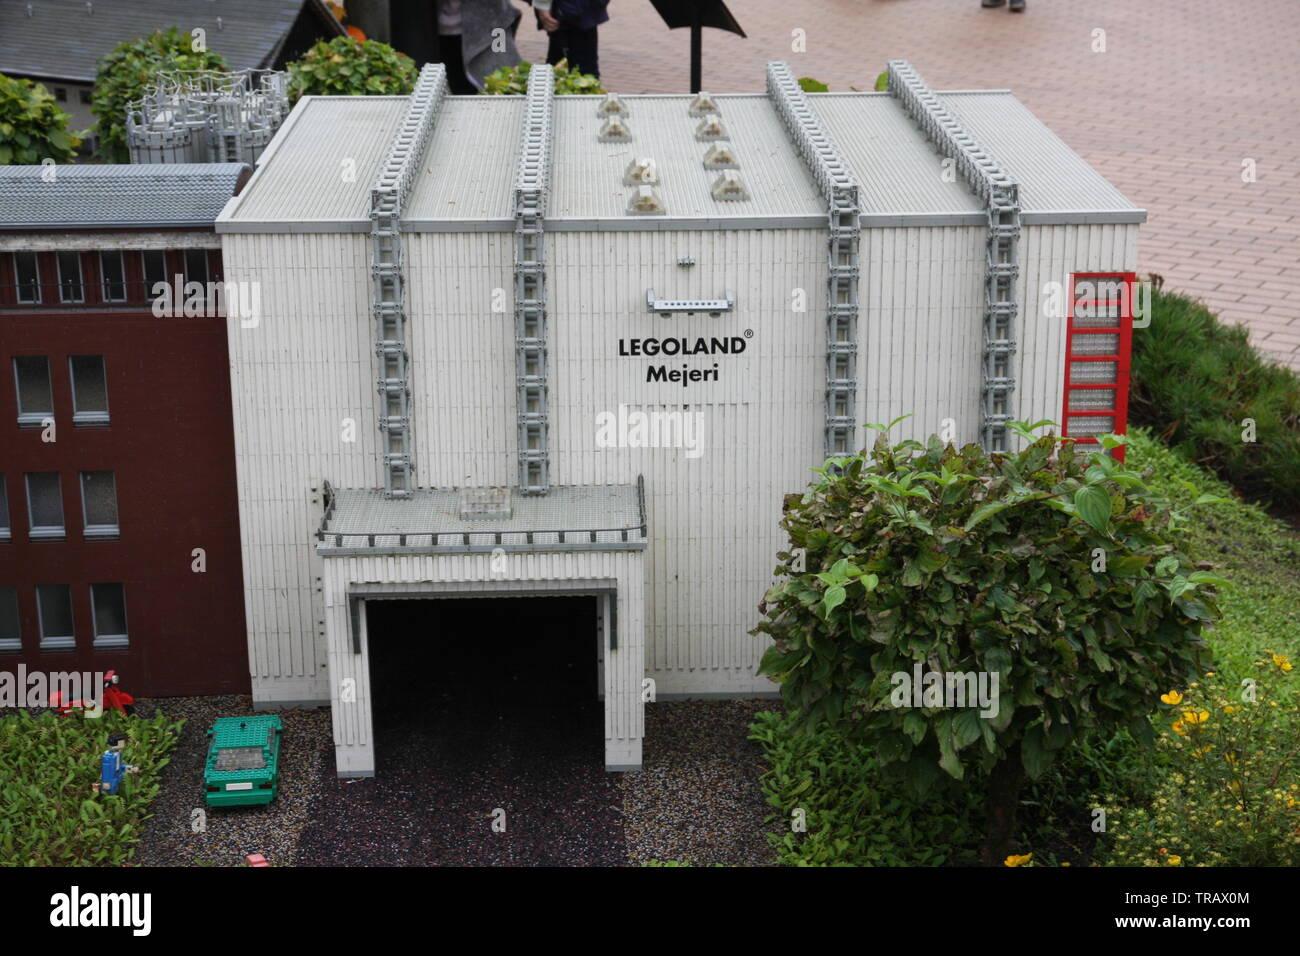 Lego House Houses Stock Photos & Lego House Houses Stock Images - Alamy